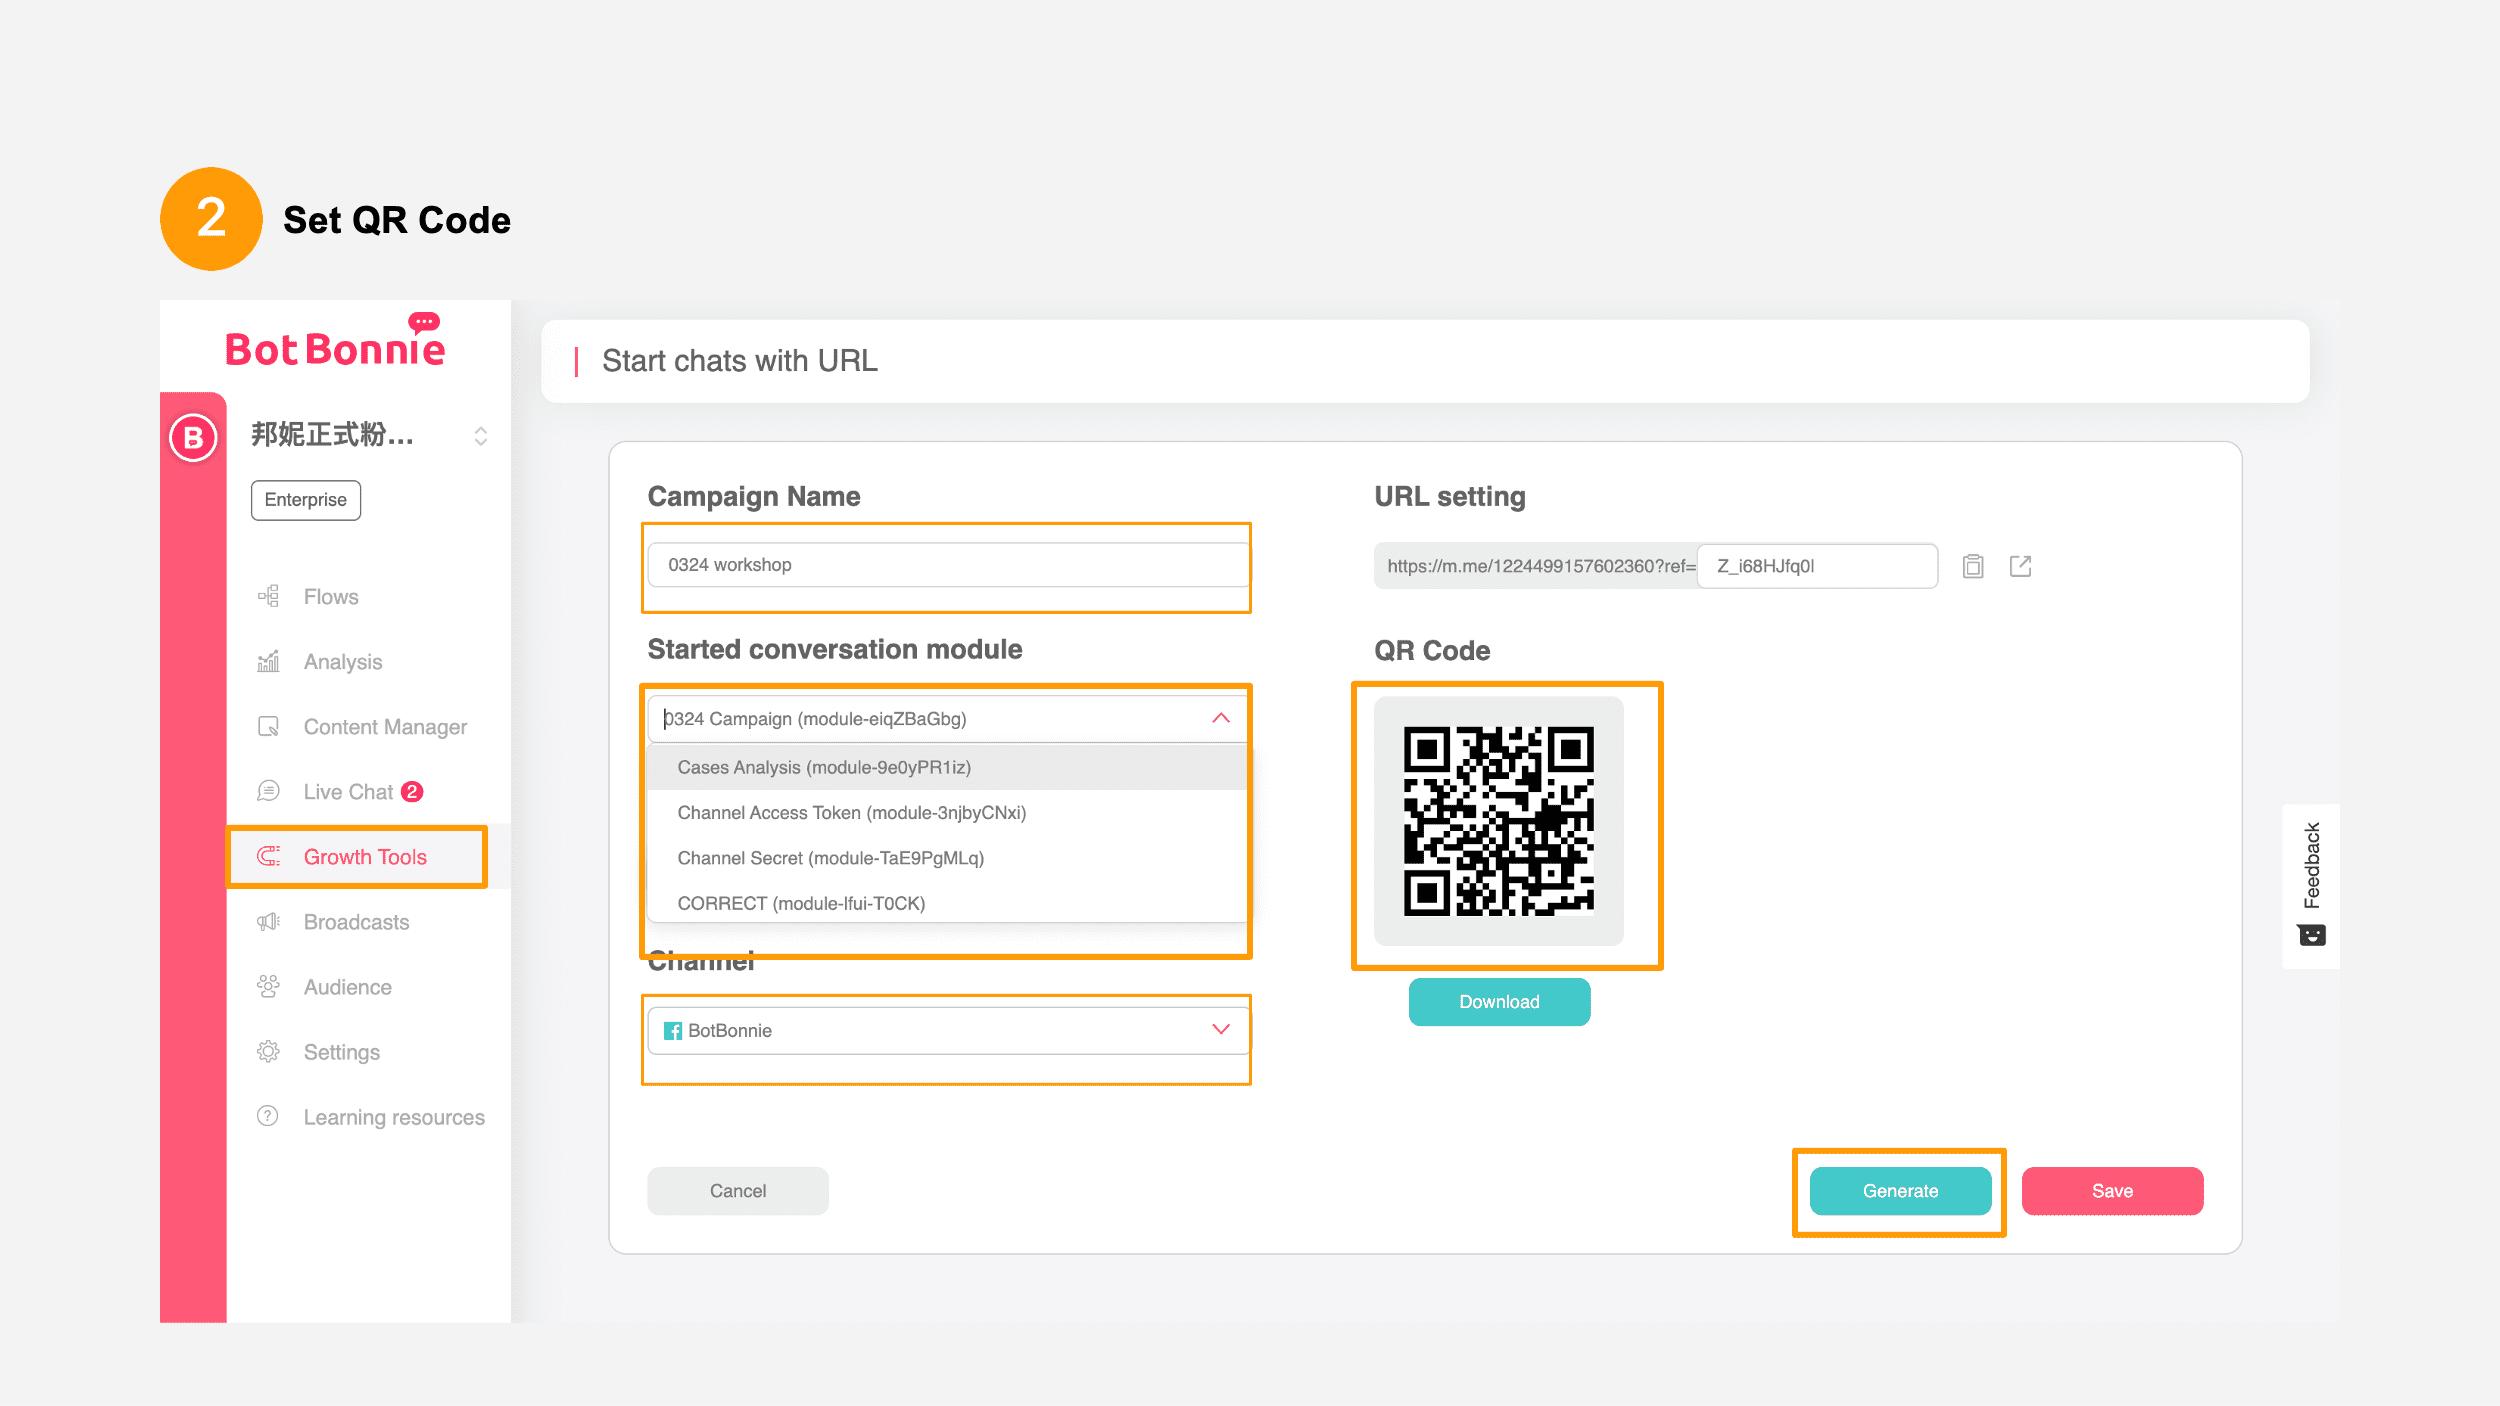 Set QR code